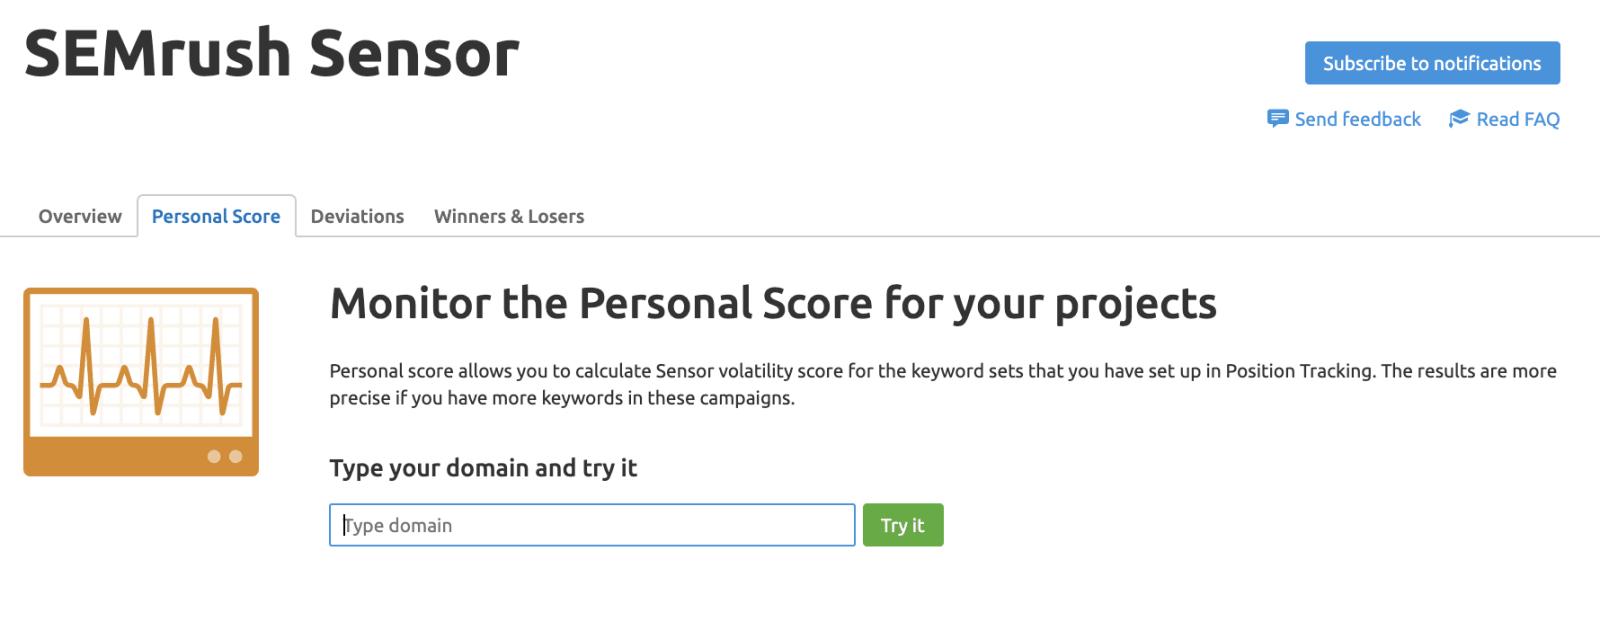 SEMrush Sensor personal score